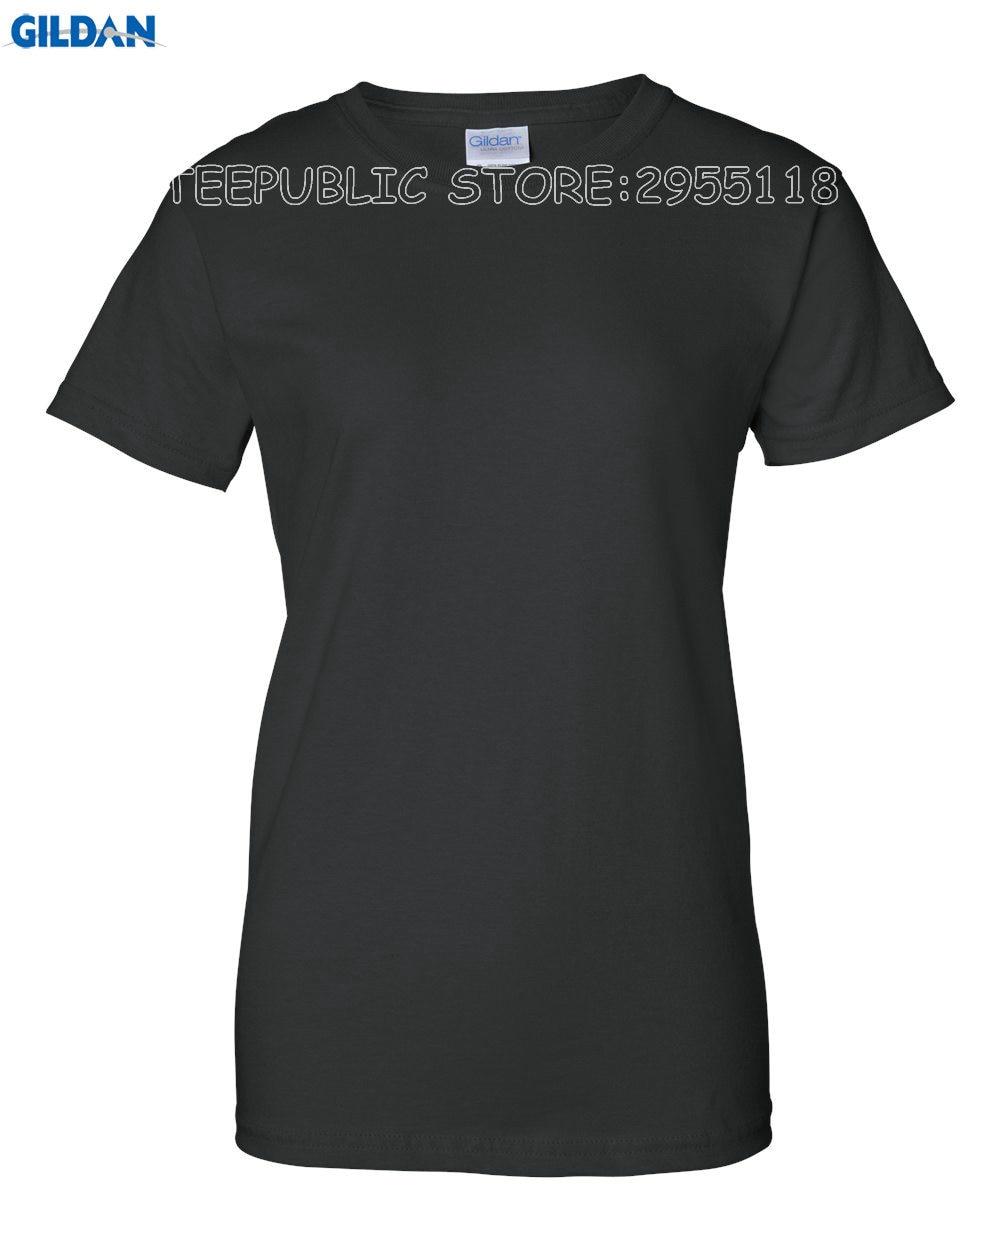 Gildan T Shirt Websites Short Women Princesses Are Born In March ...